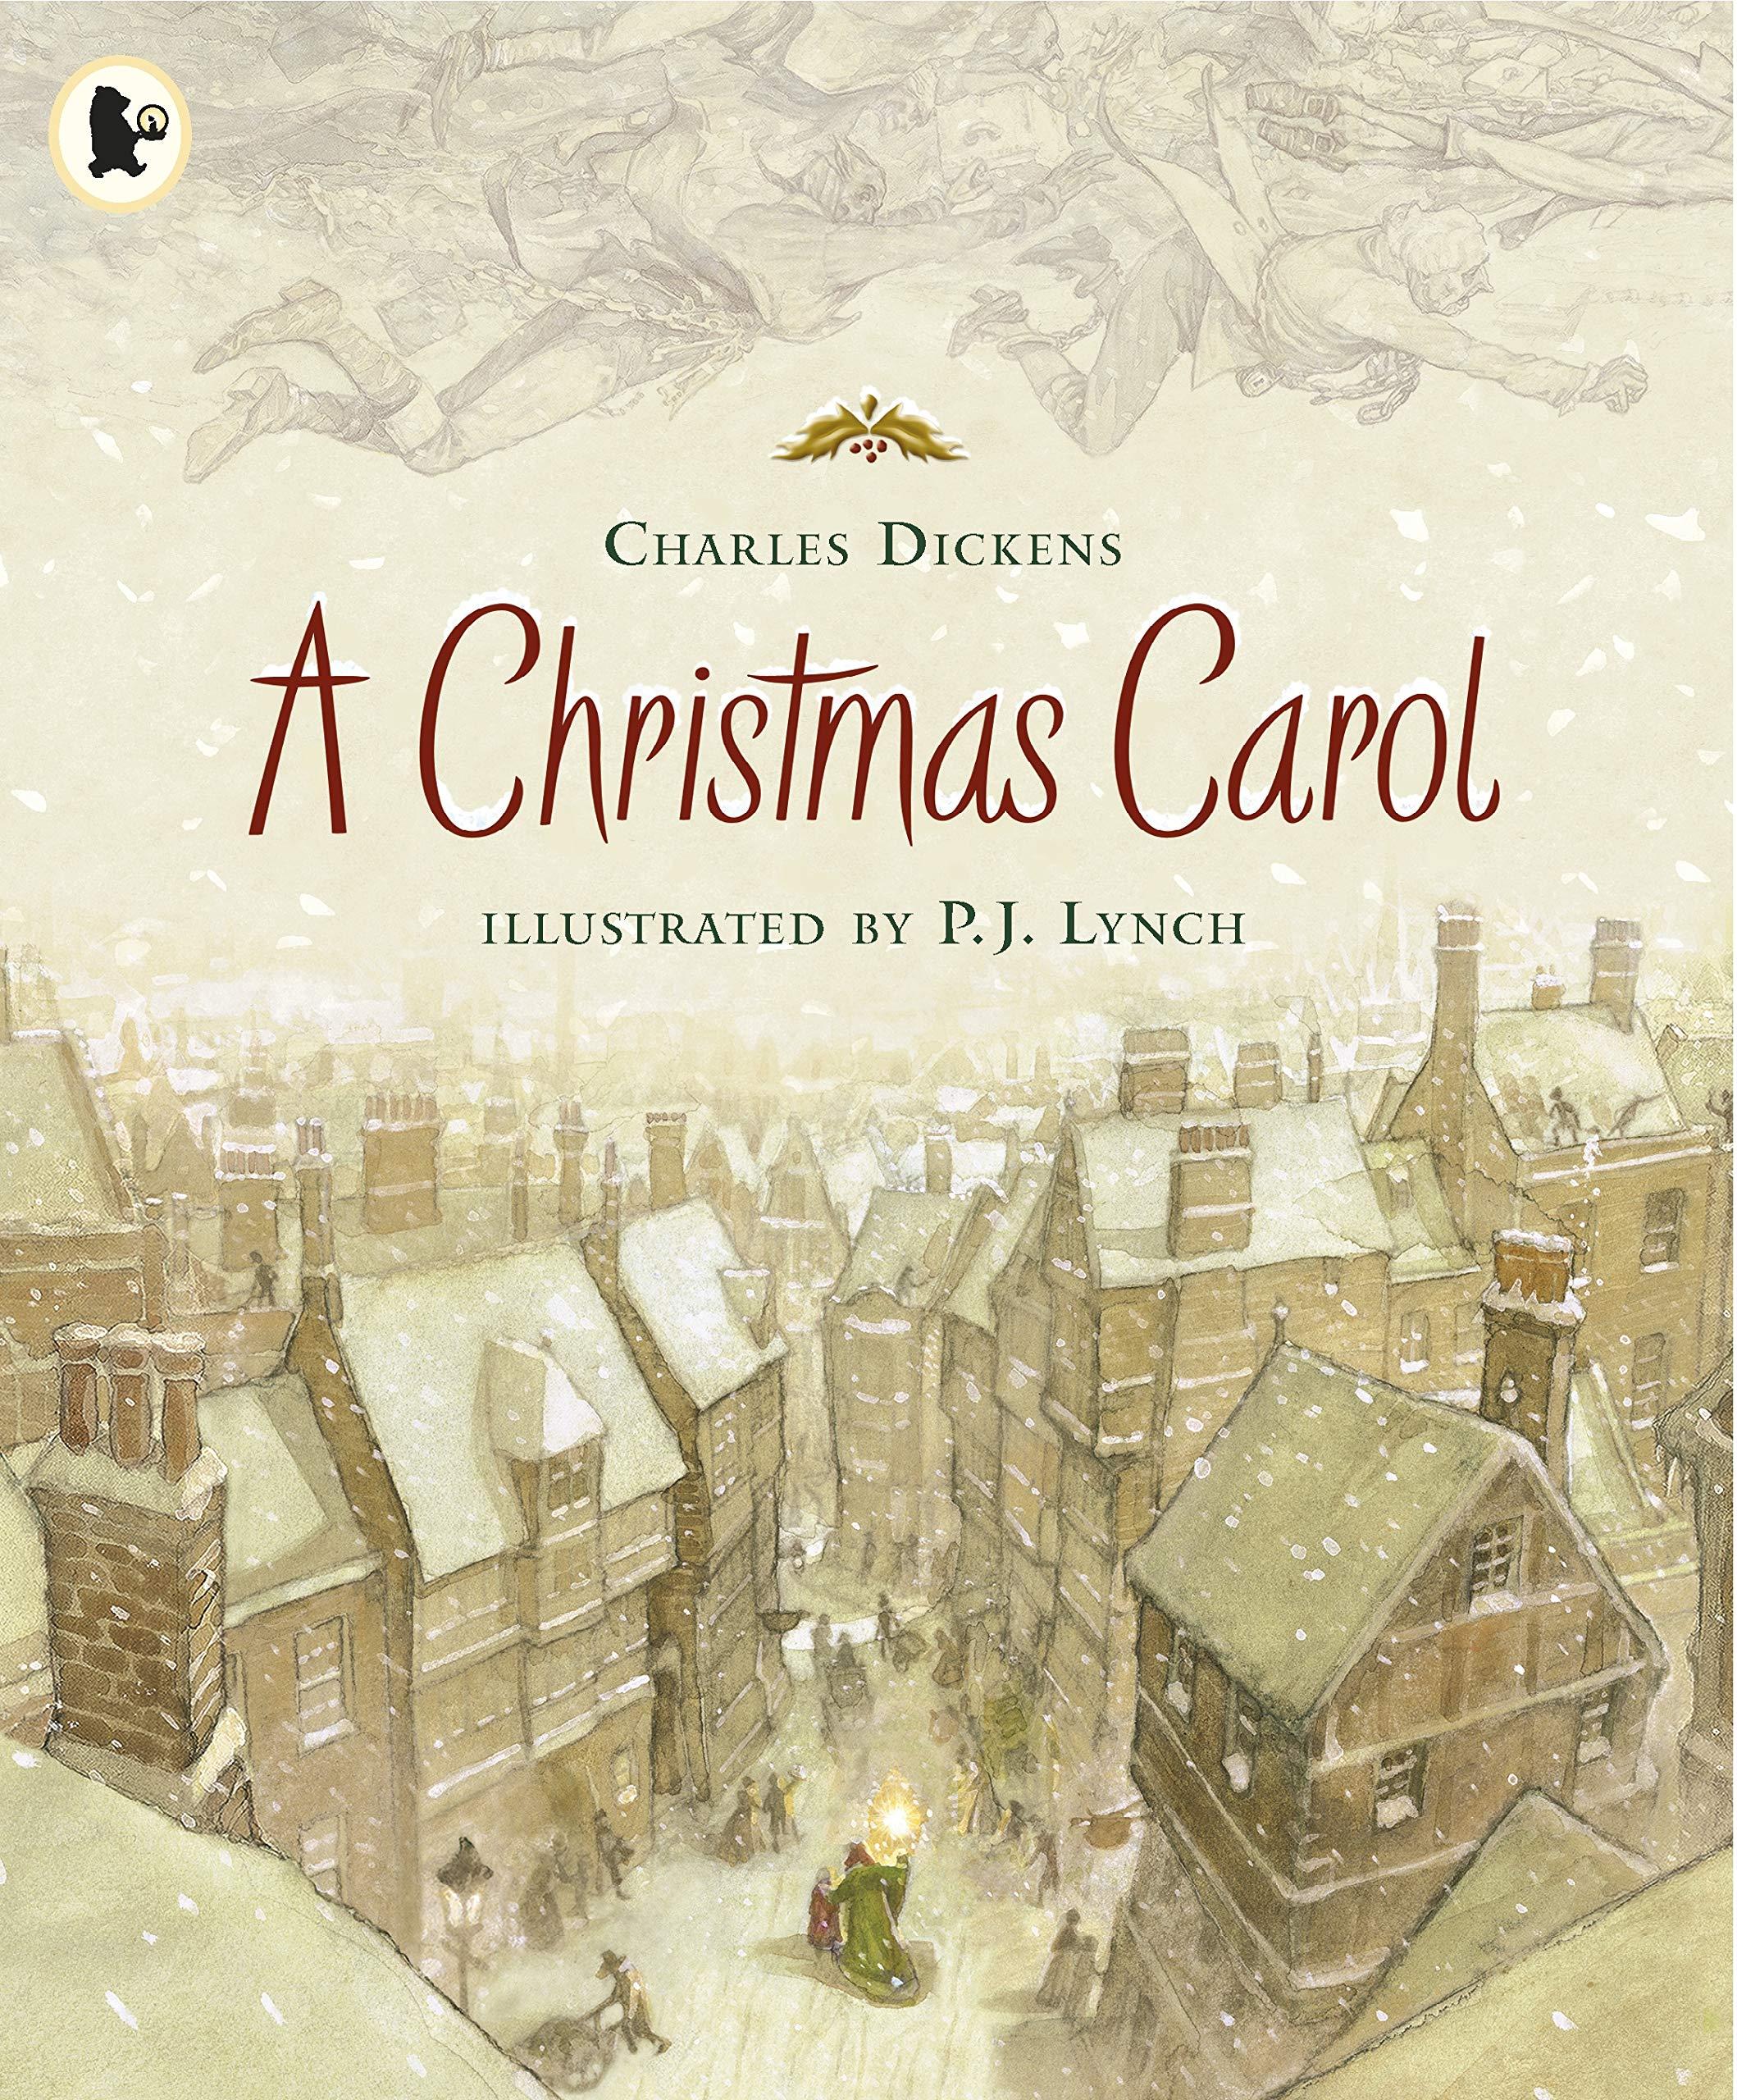 A Christmas Carol: Amazon.co.uk: Dickens, Charles, Lynch, P. J.: Books